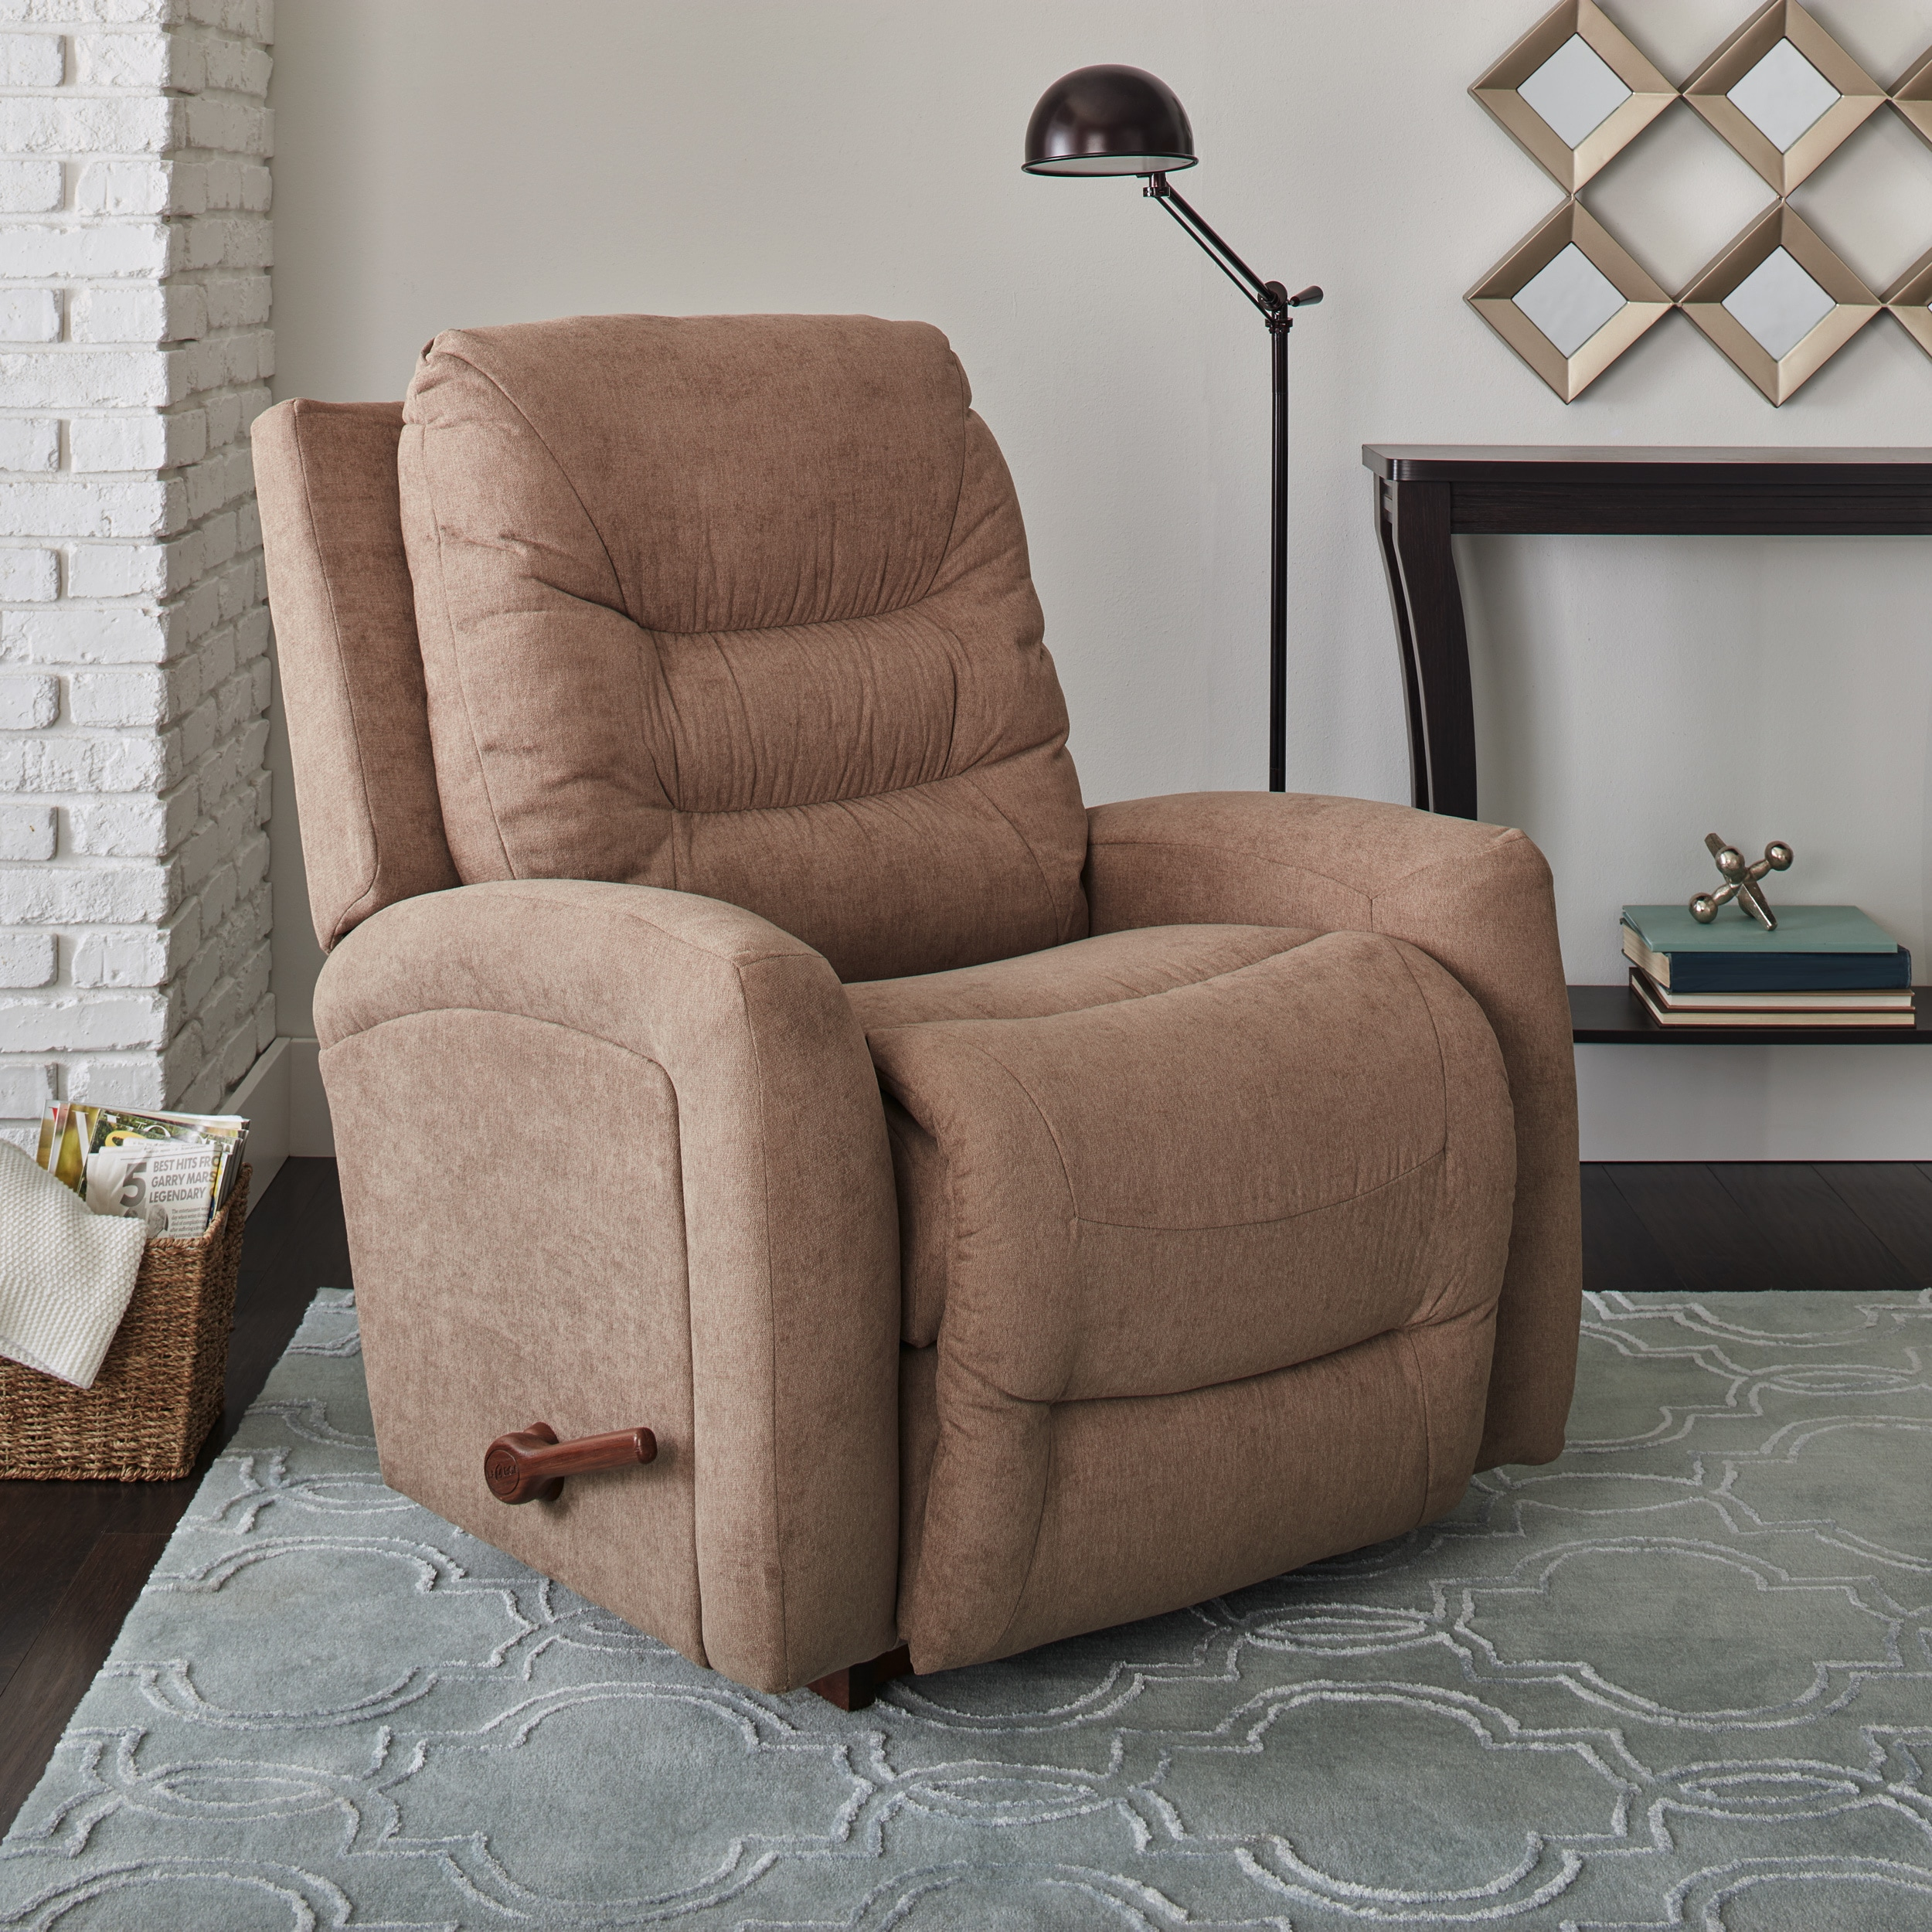 Shop La Z Boy Ace Beige Fabric Recliner - Free Shipping Today ...